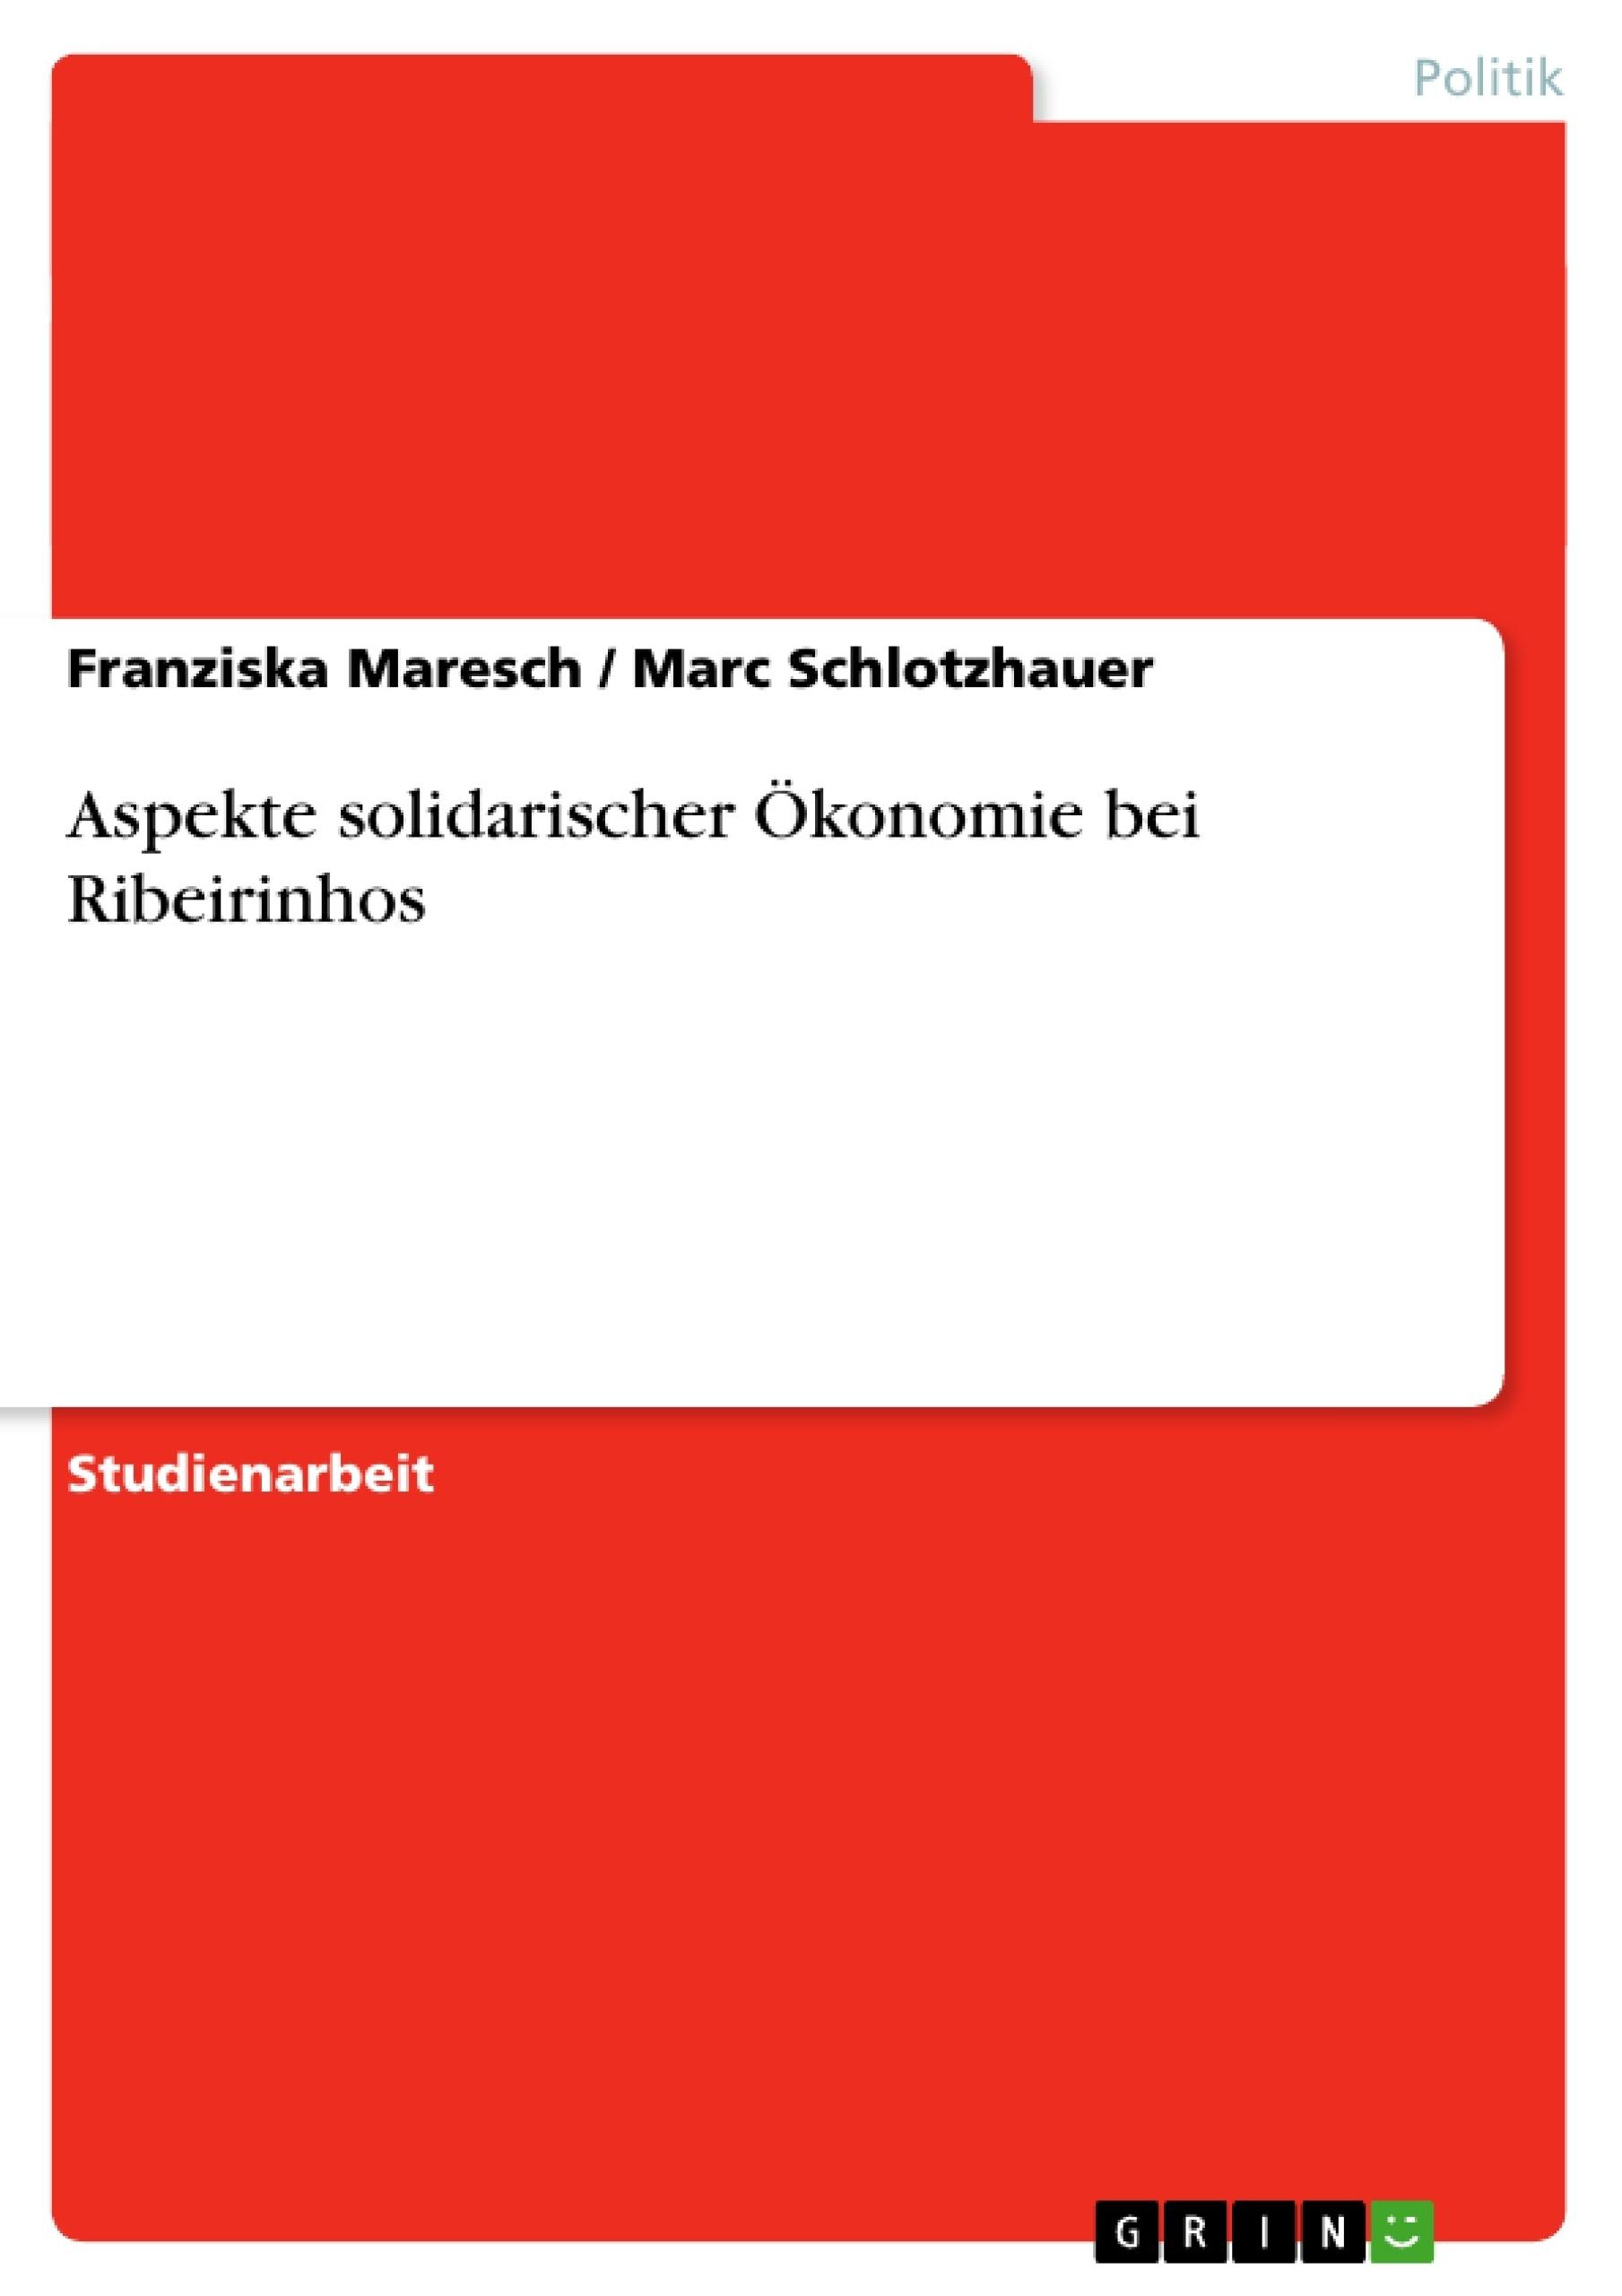 Titel: Aspekte solidarischer Ökonomie bei Ribeirinhos